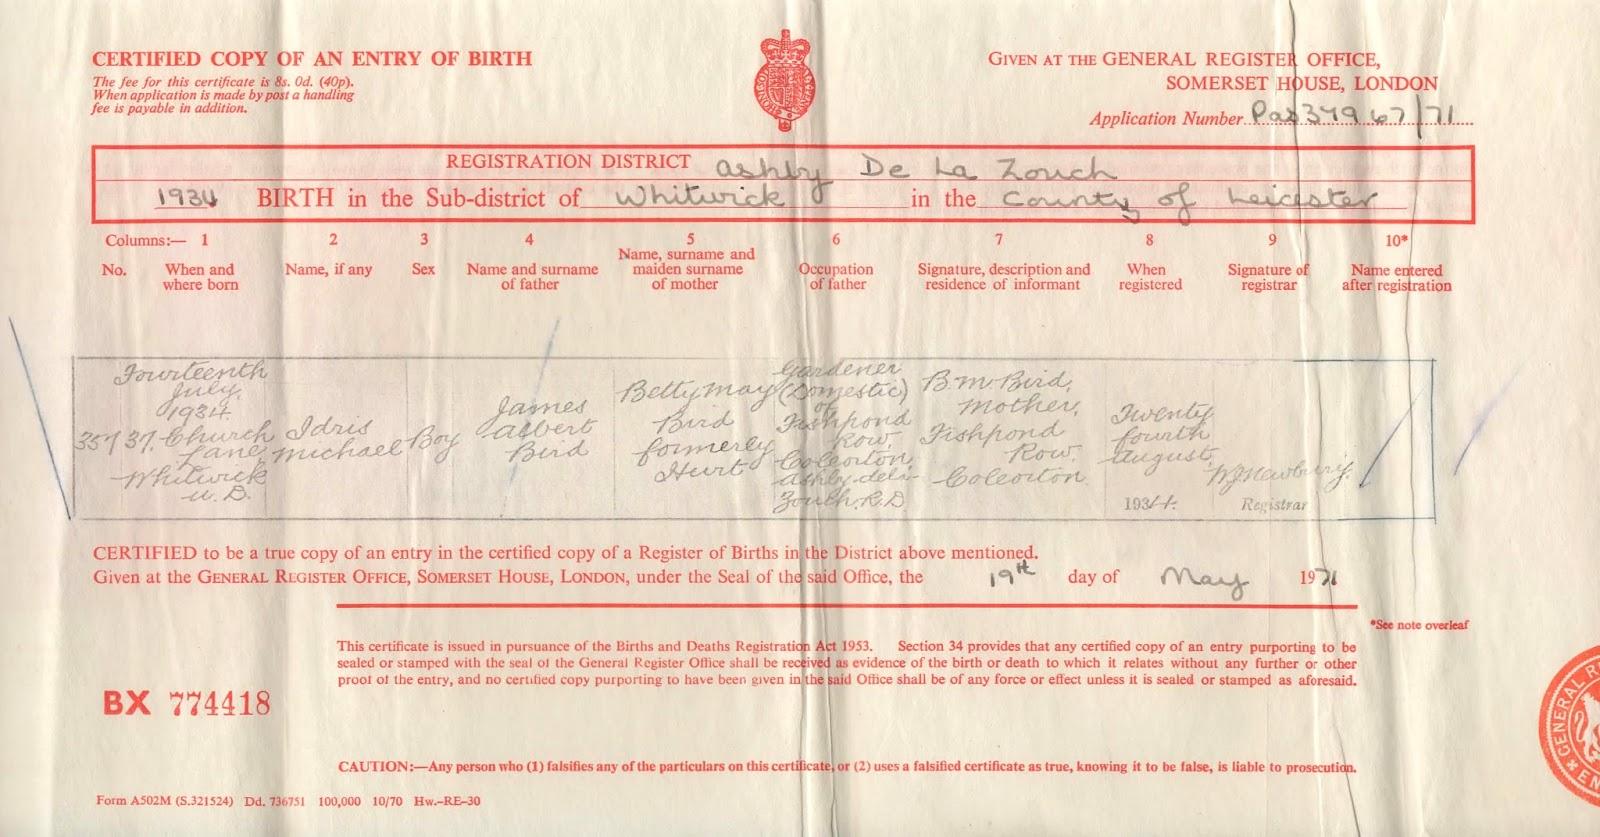 Kiki nakita the bird family 8 generations my granddad michaels birth certificate for july 14th 1934 aiddatafo Choice Image